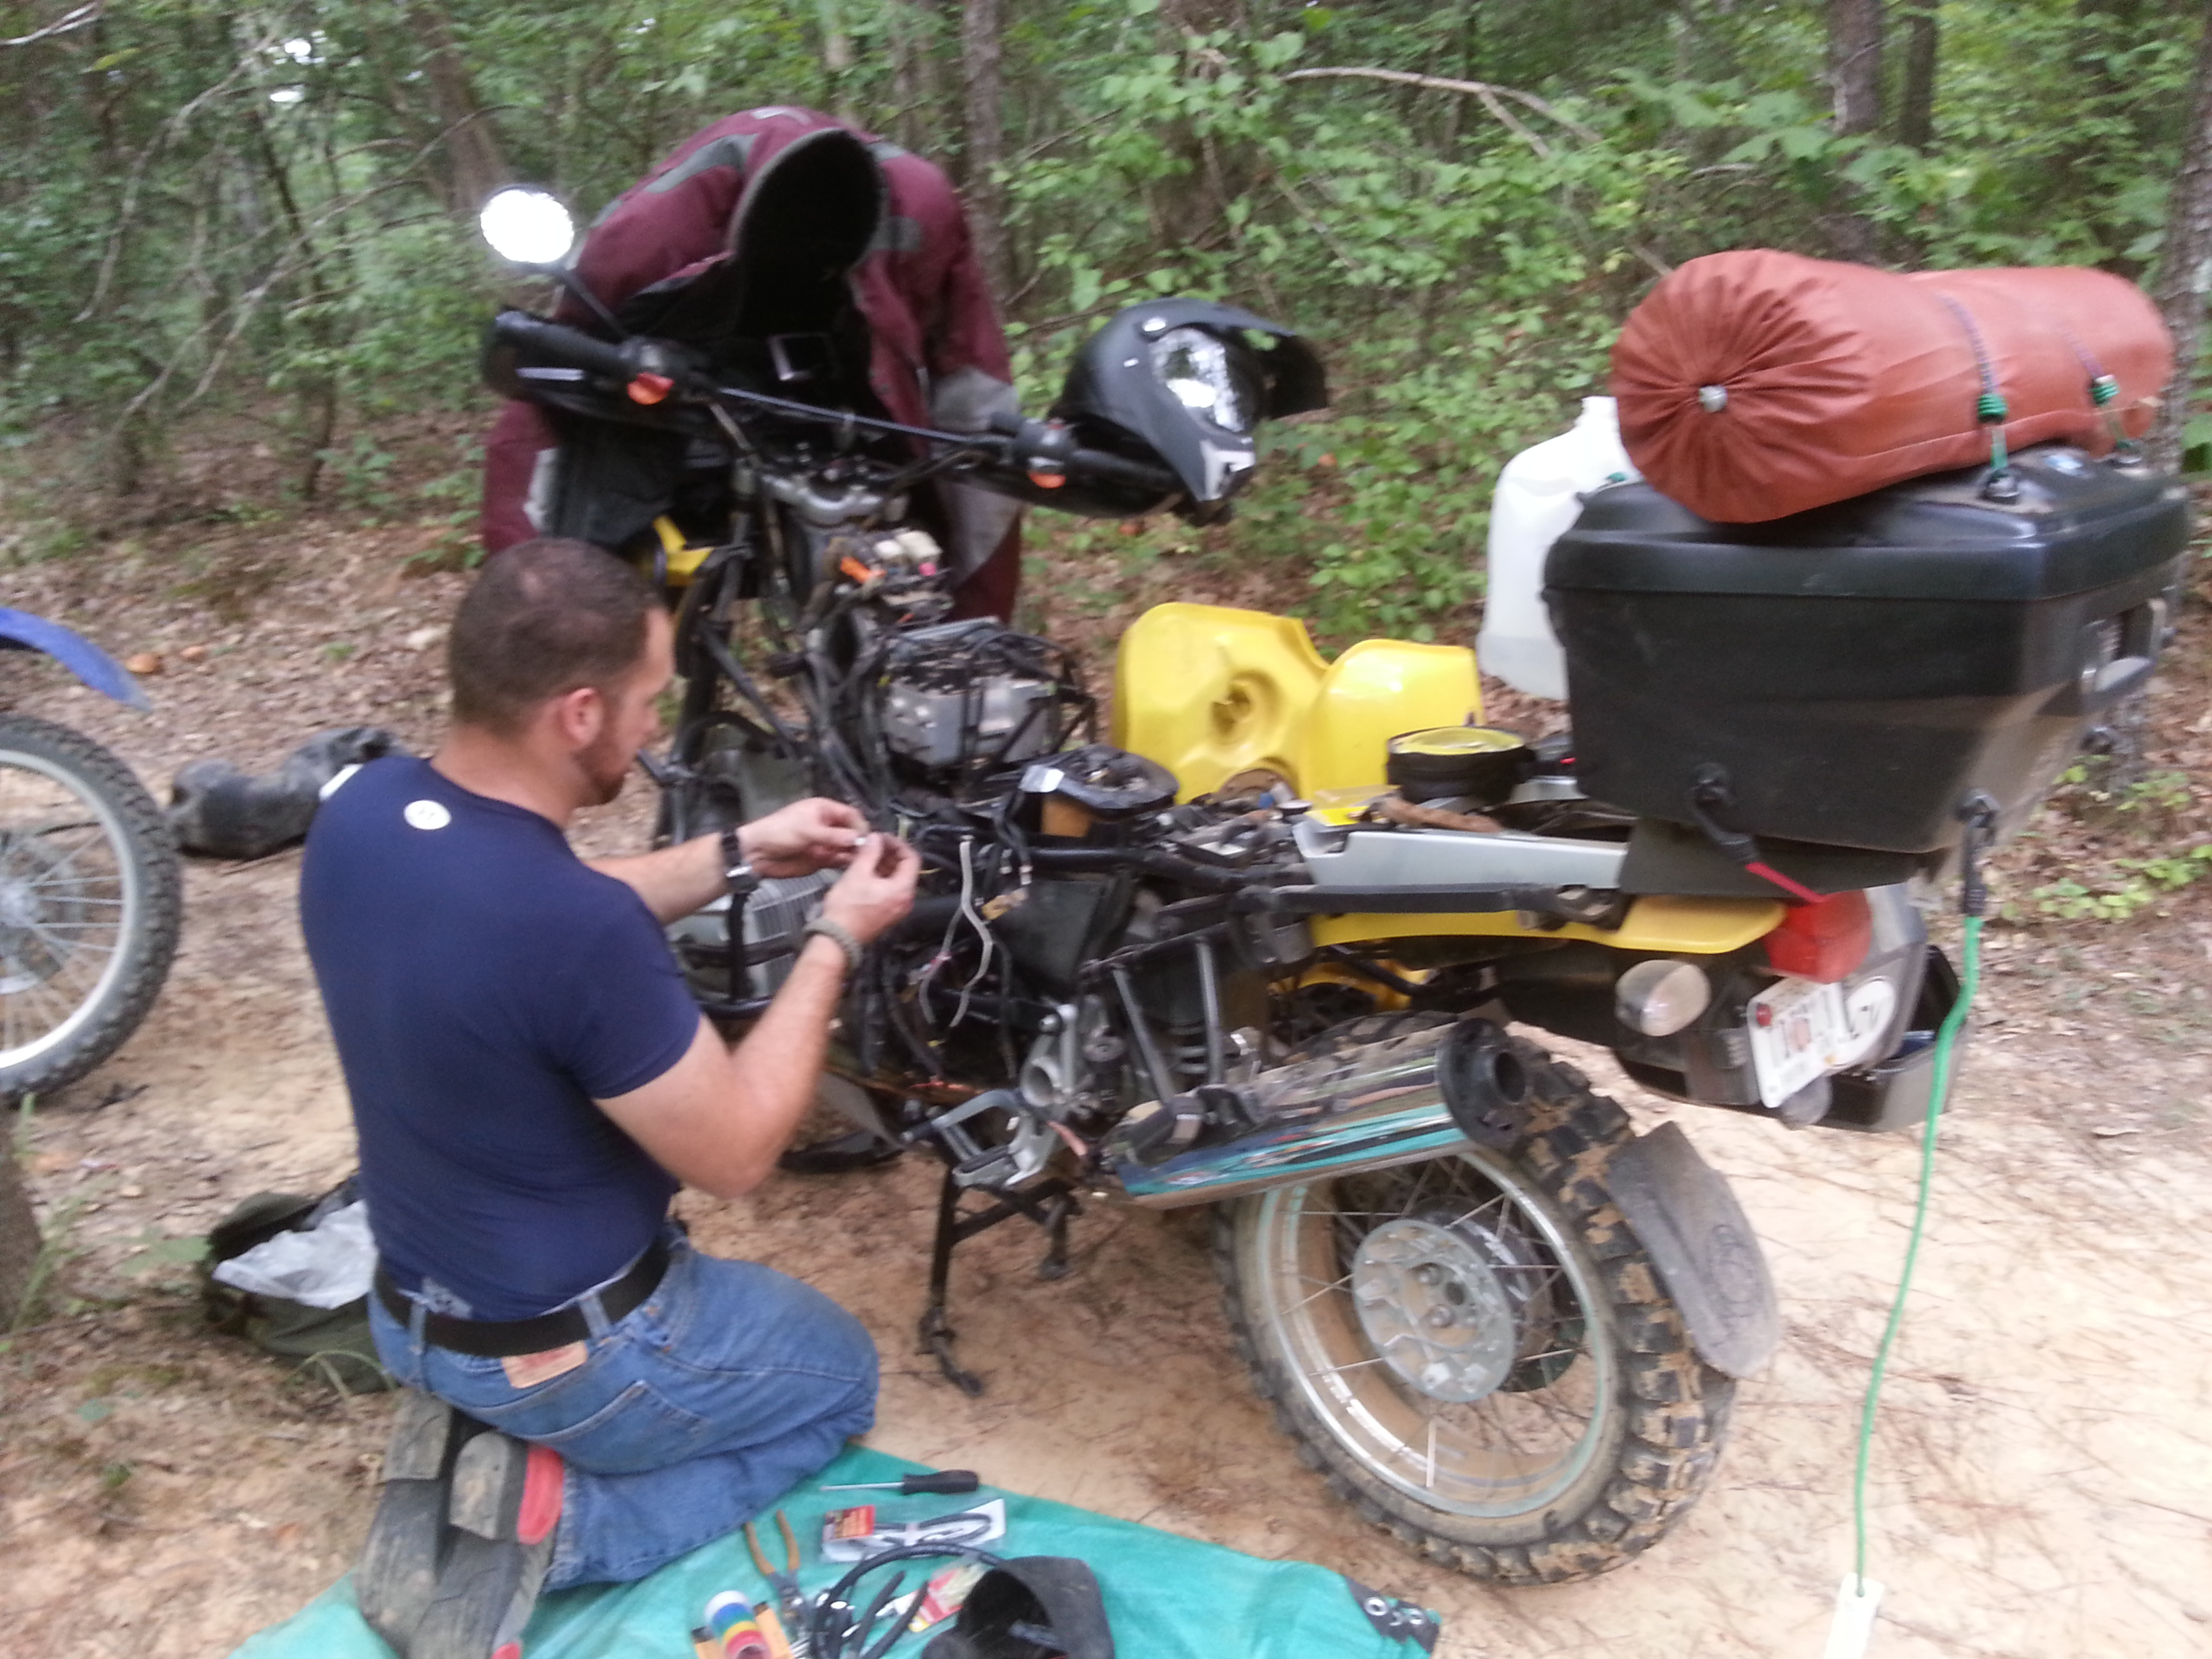 Damon working on his bike